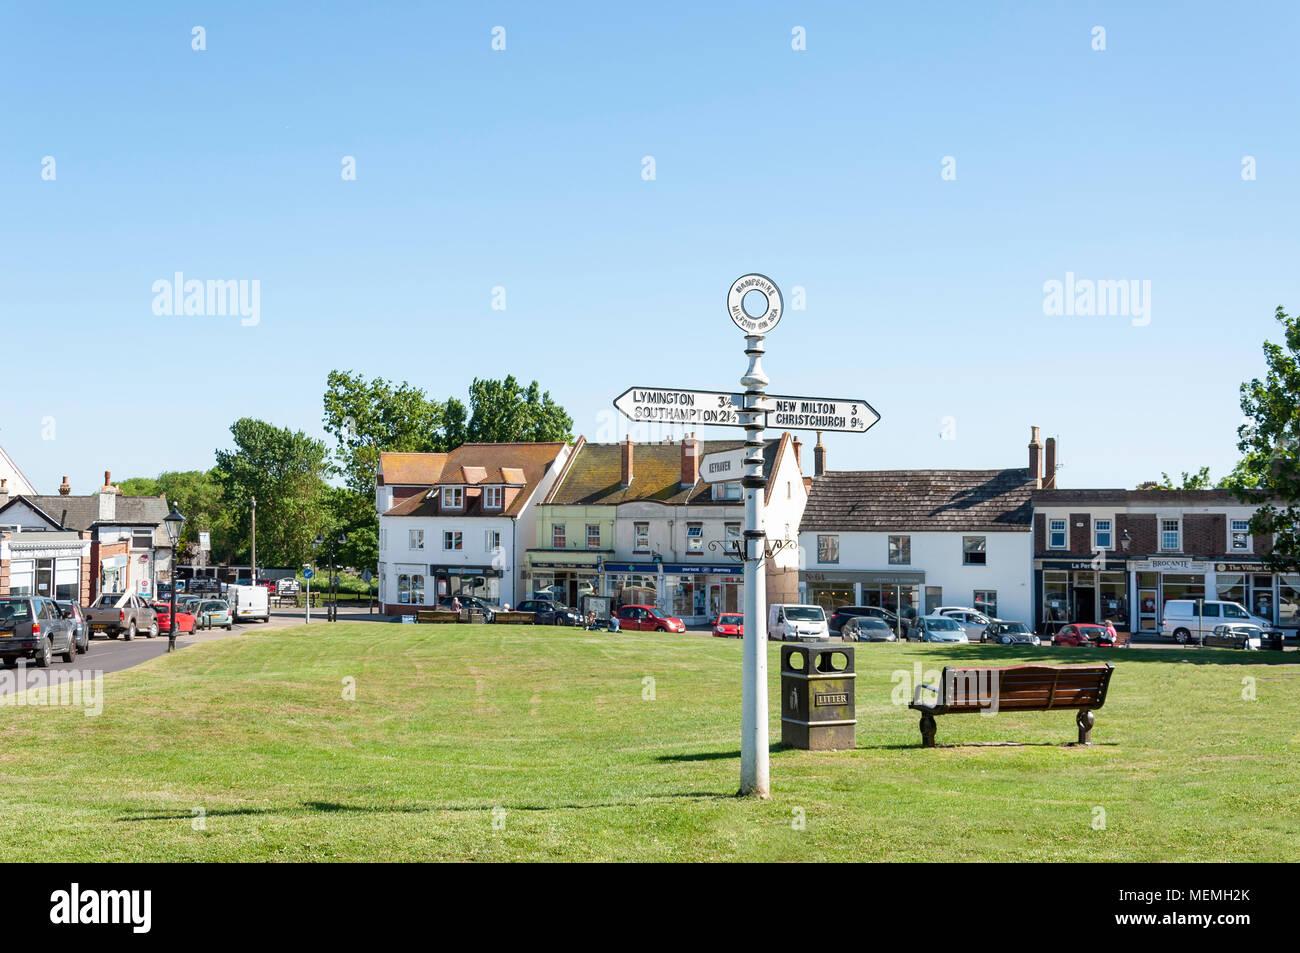 The village green, Milford-on-Sea, Hampshire, England, United Kingdom - Stock Image